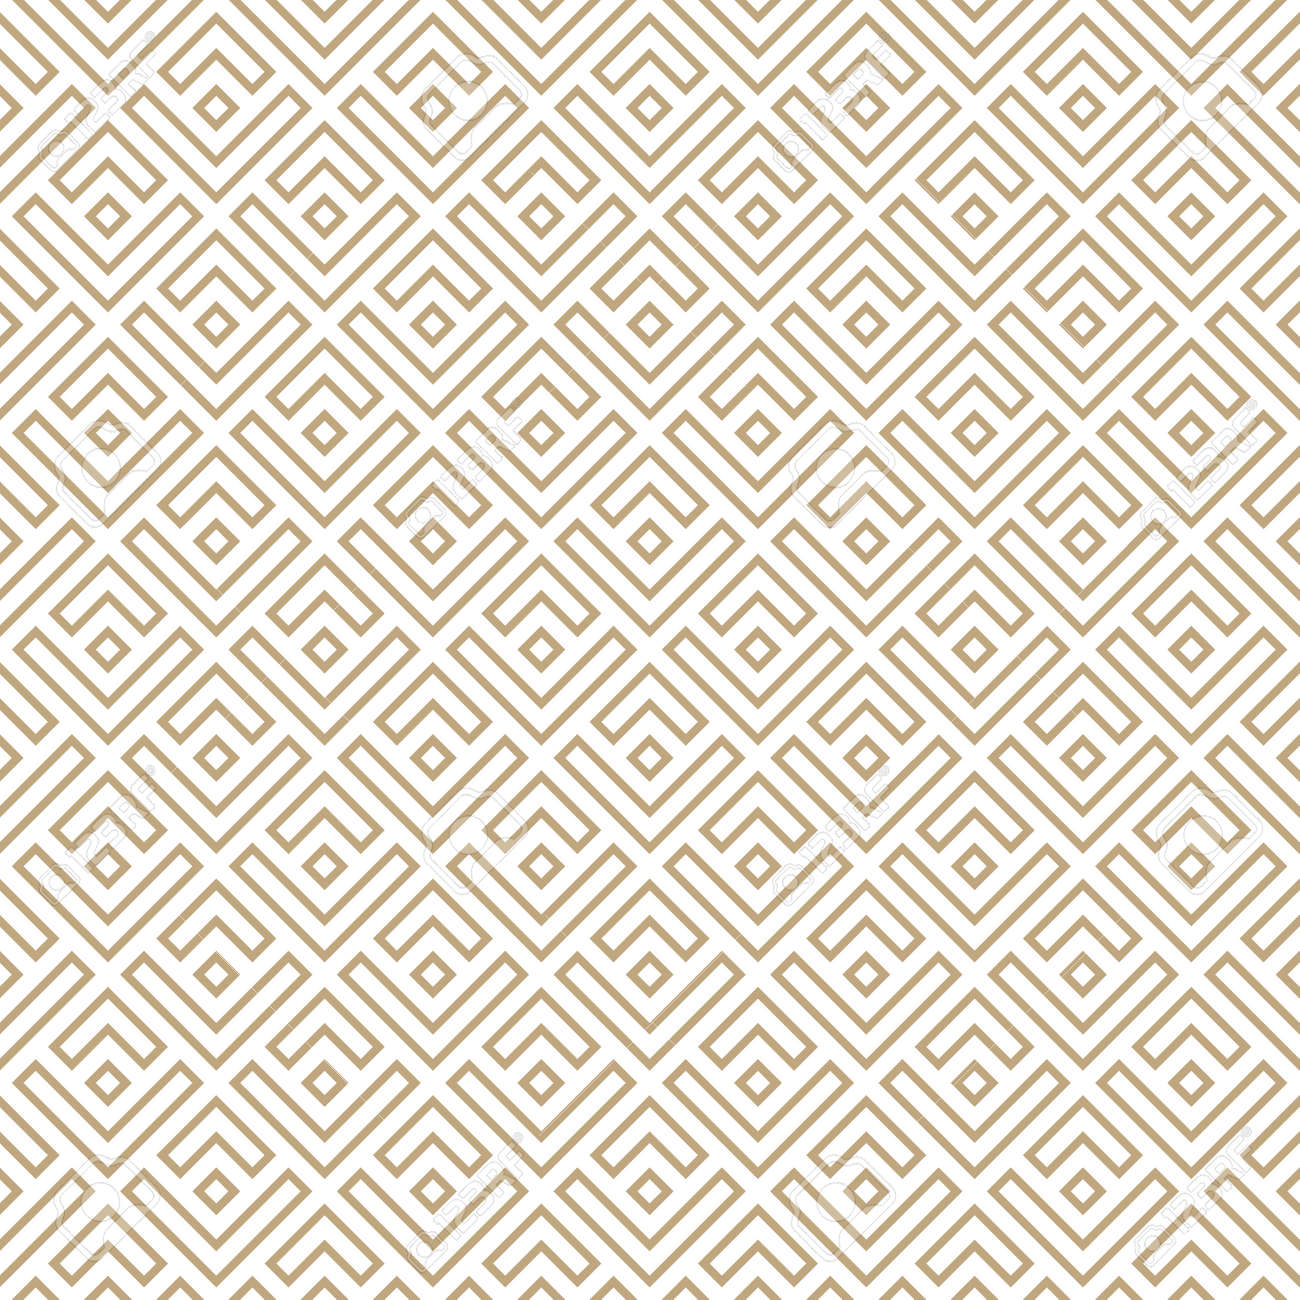 Seamless simple gold geometric pattern. Vector linear modern texture. - 151009461